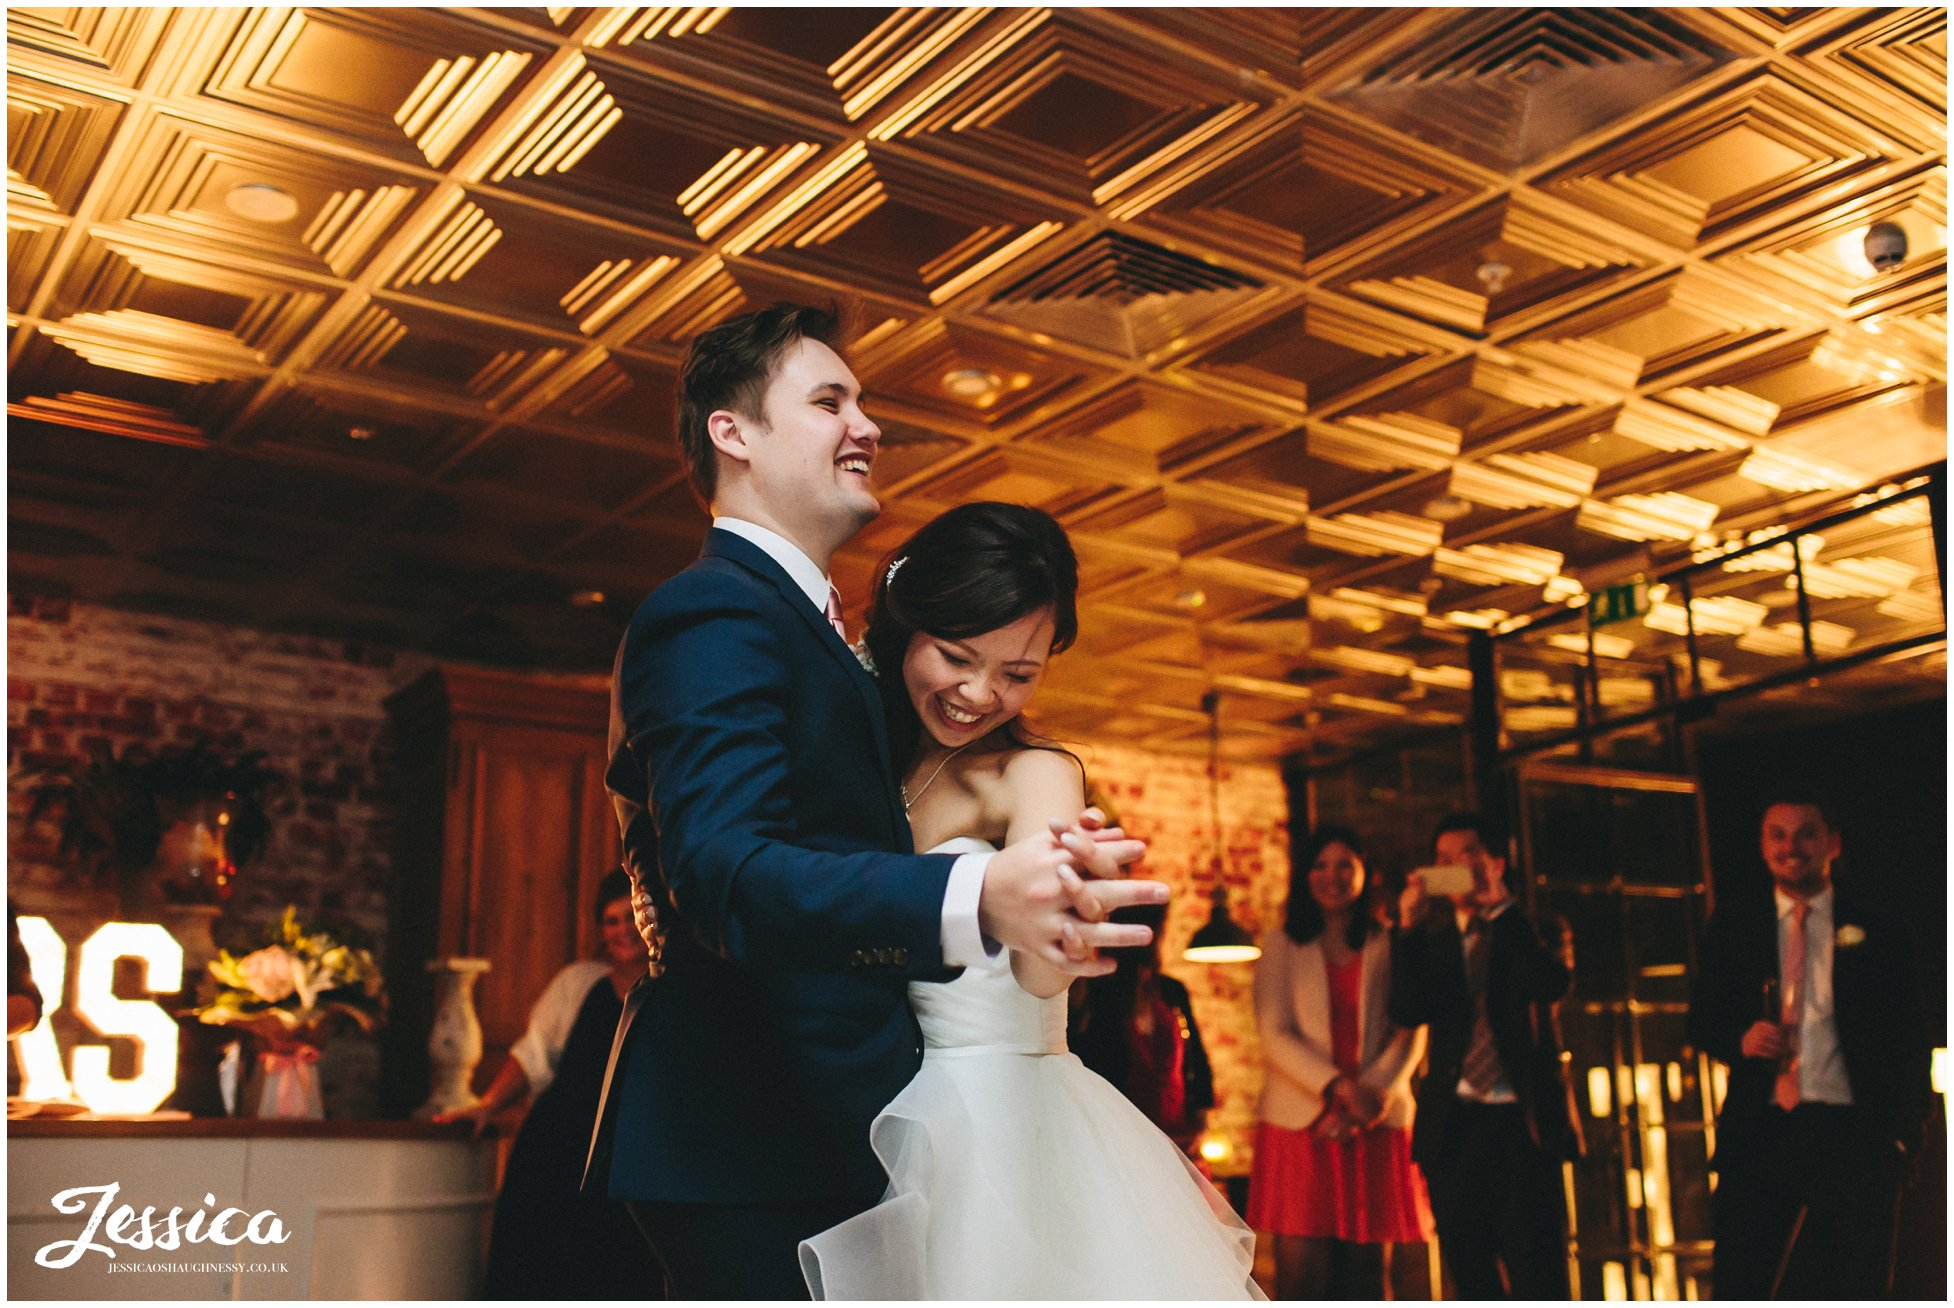 zoe & ben share their their first dance - manchester wedding photography